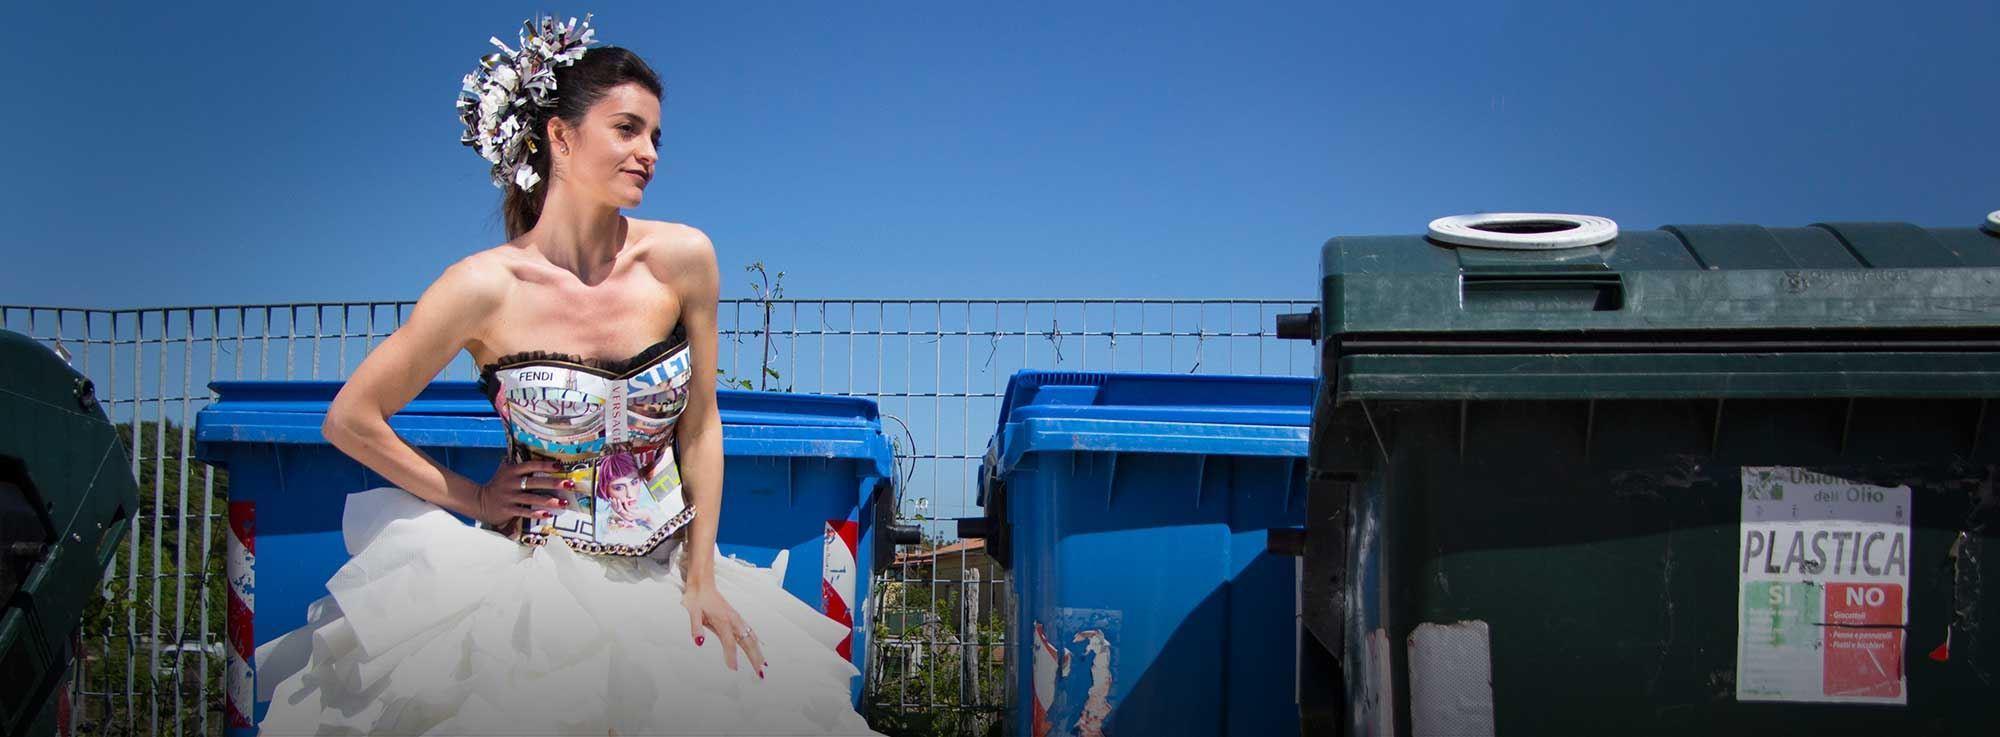 Stornarella: Rifiuti d'alta moda